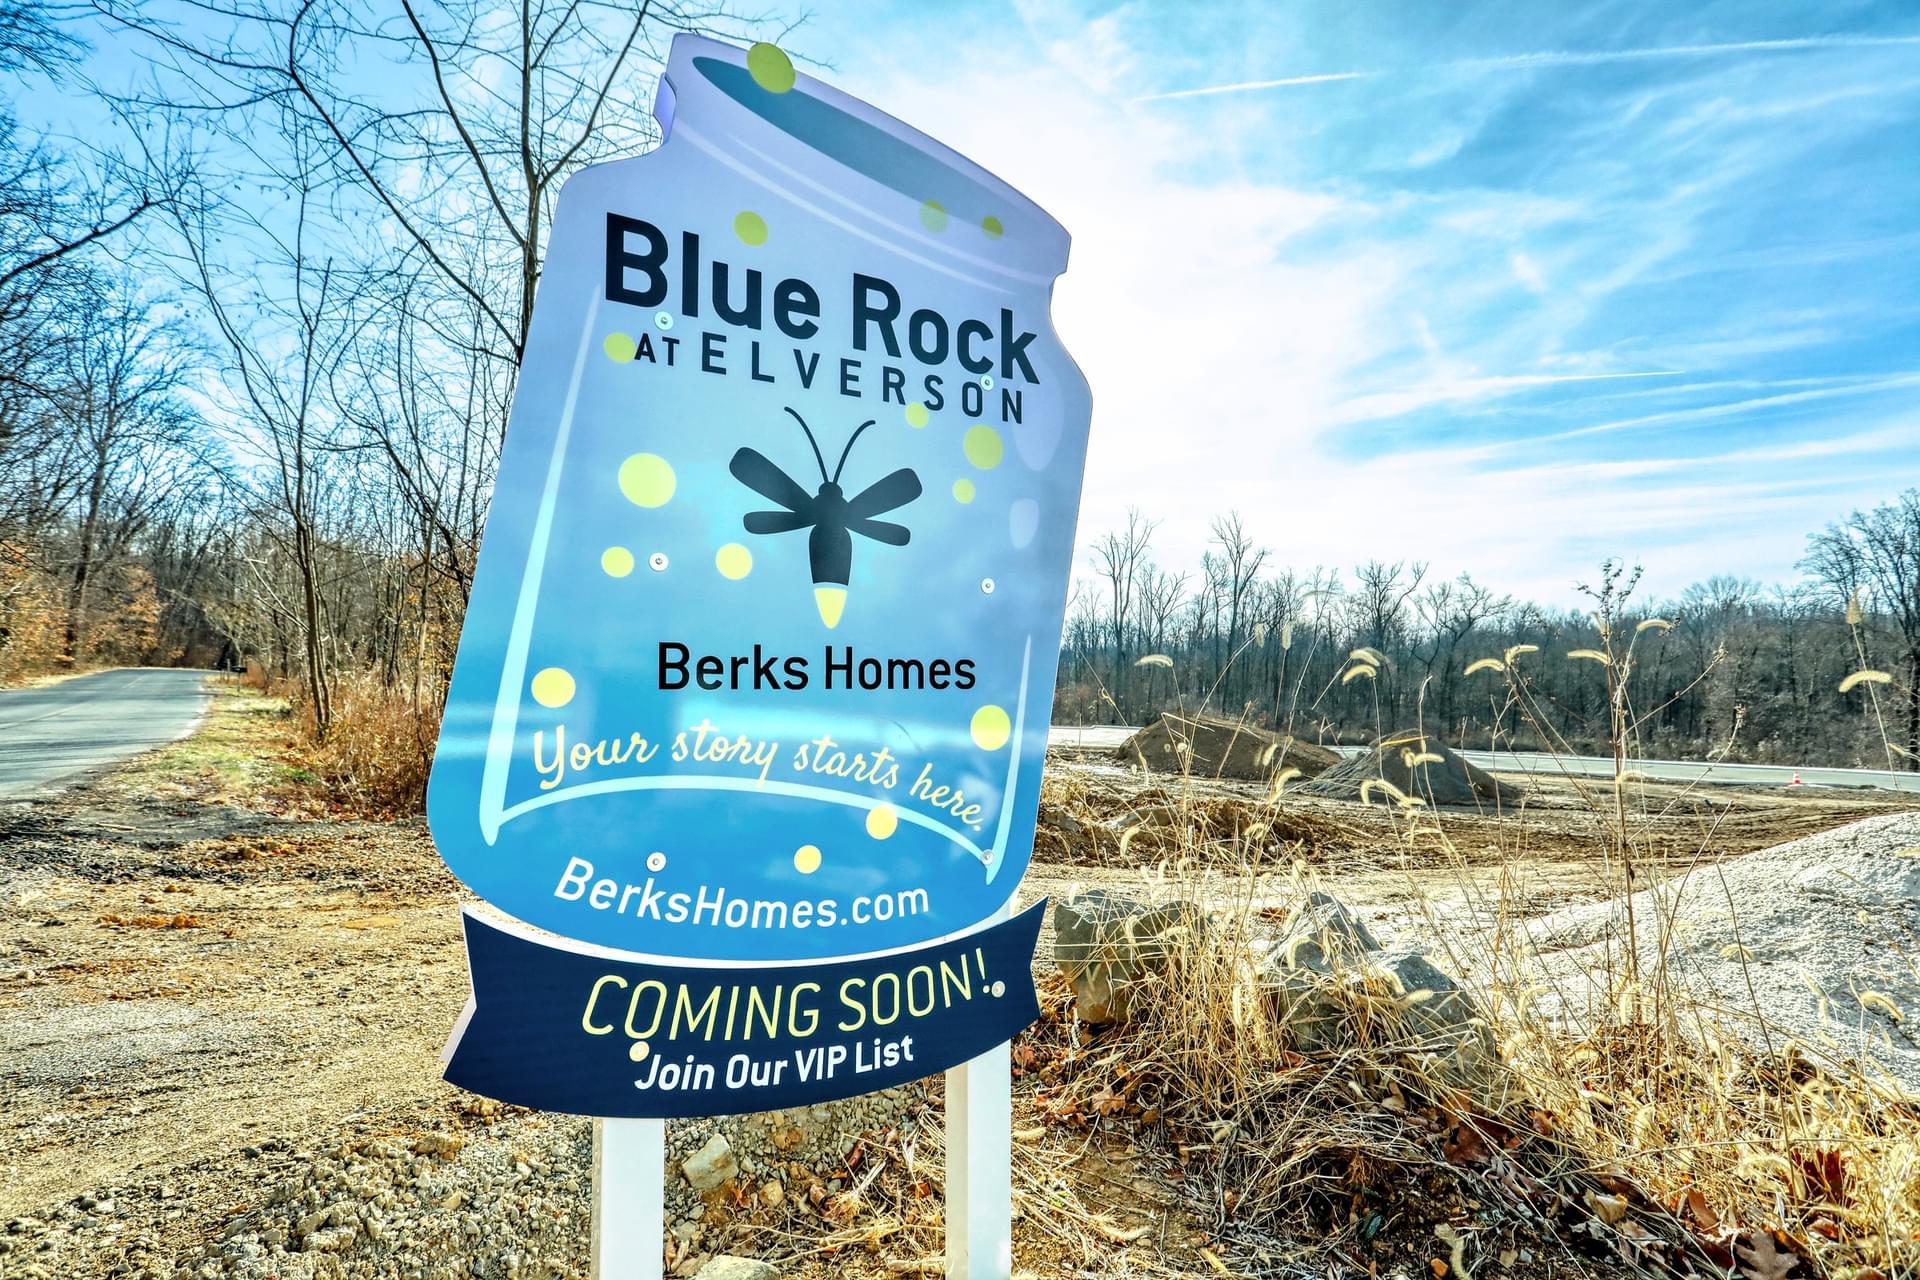 Berks Homes Photos